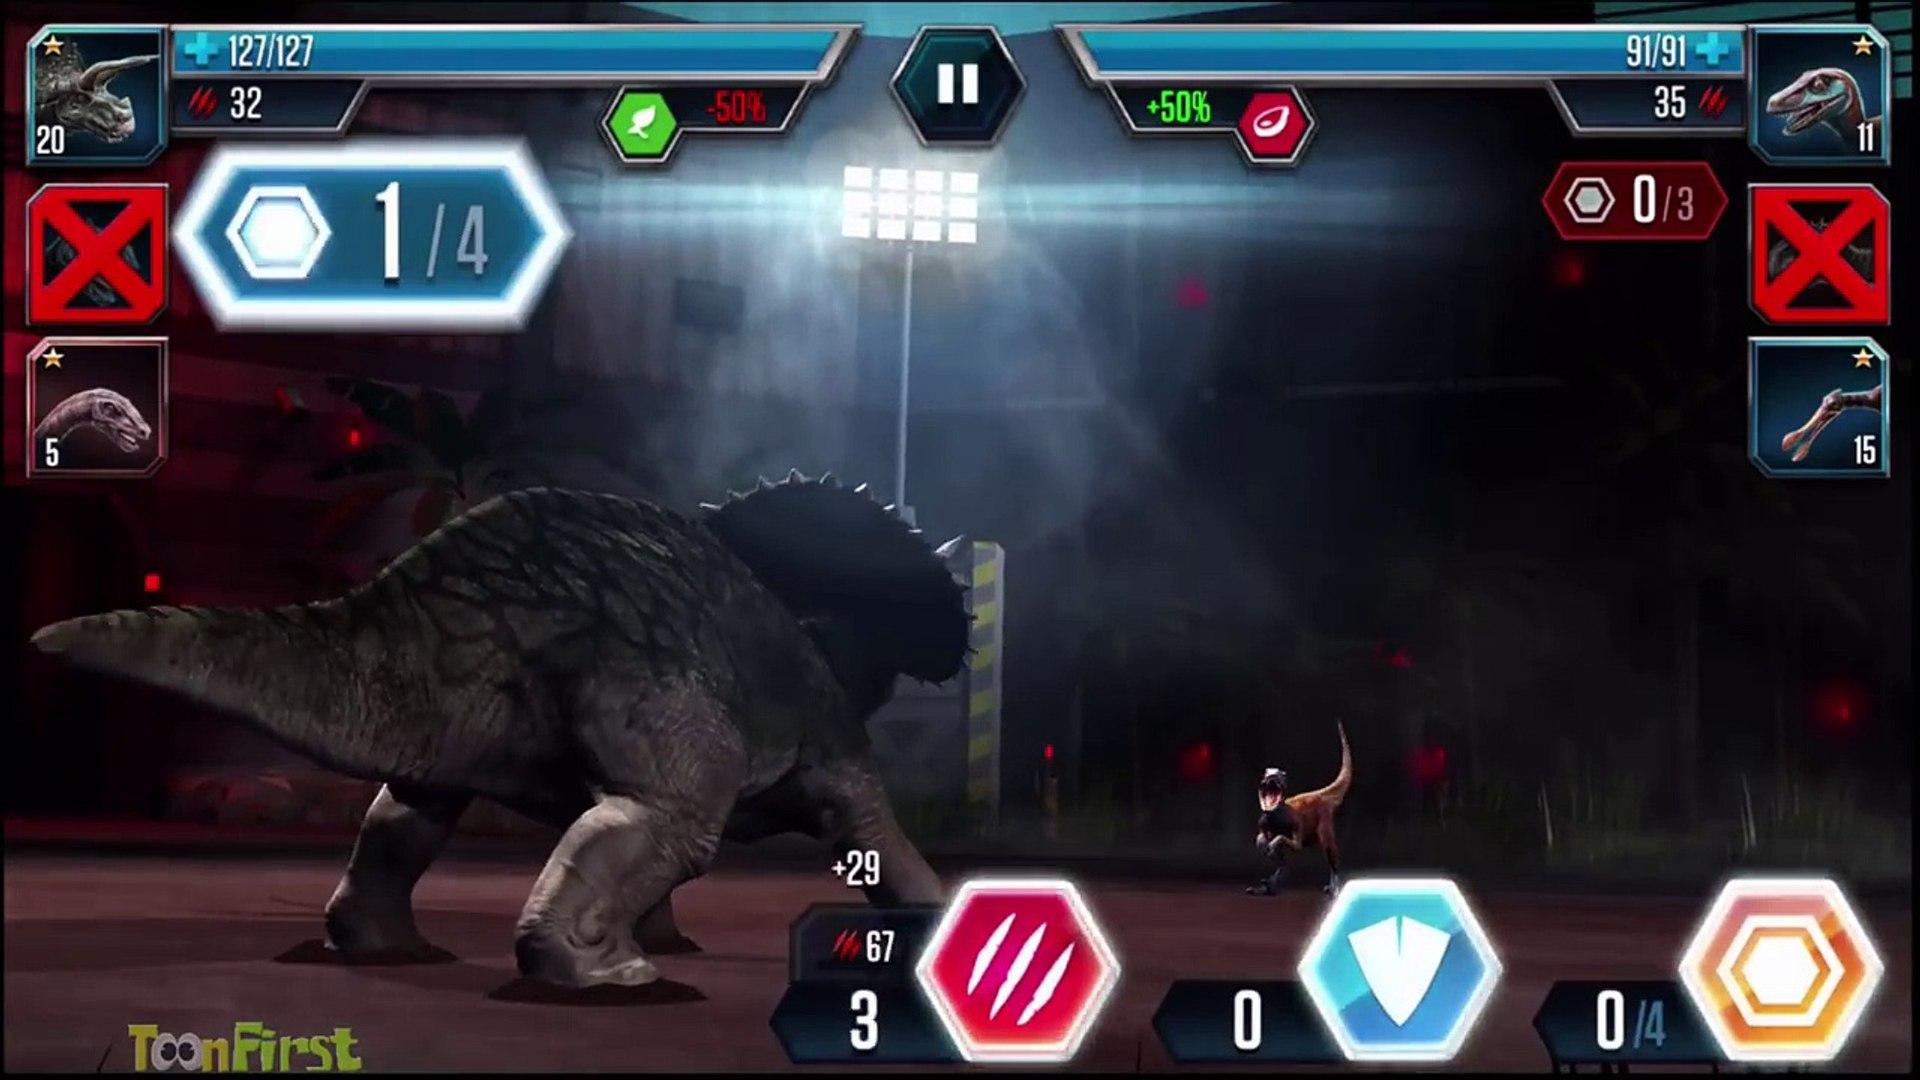 Carnotaurus Dinosaur   Jurassic World   The Game   Stage 8   video 1920x1080